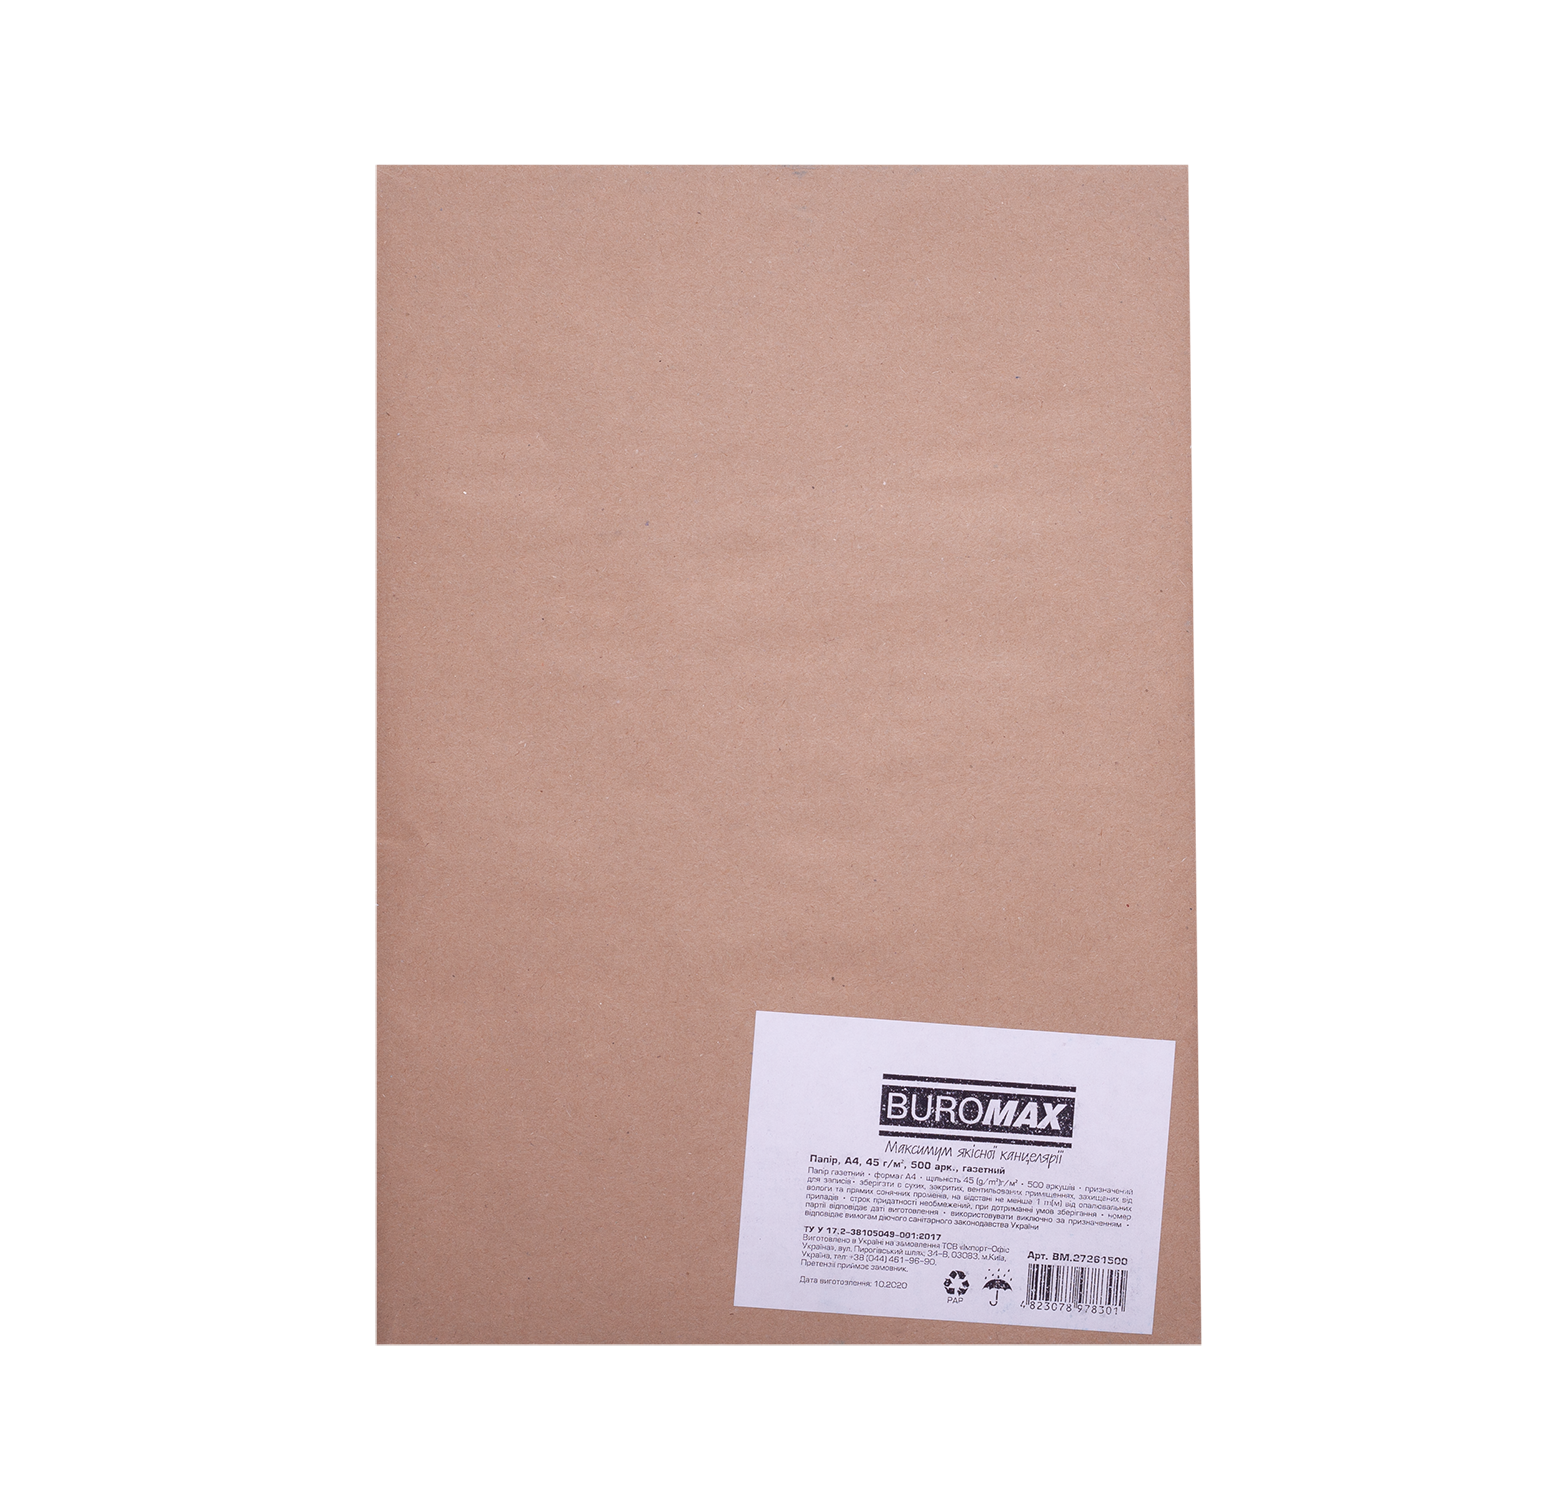 Газетная бумага BuromaxА4,45 г/м2, 500 листов